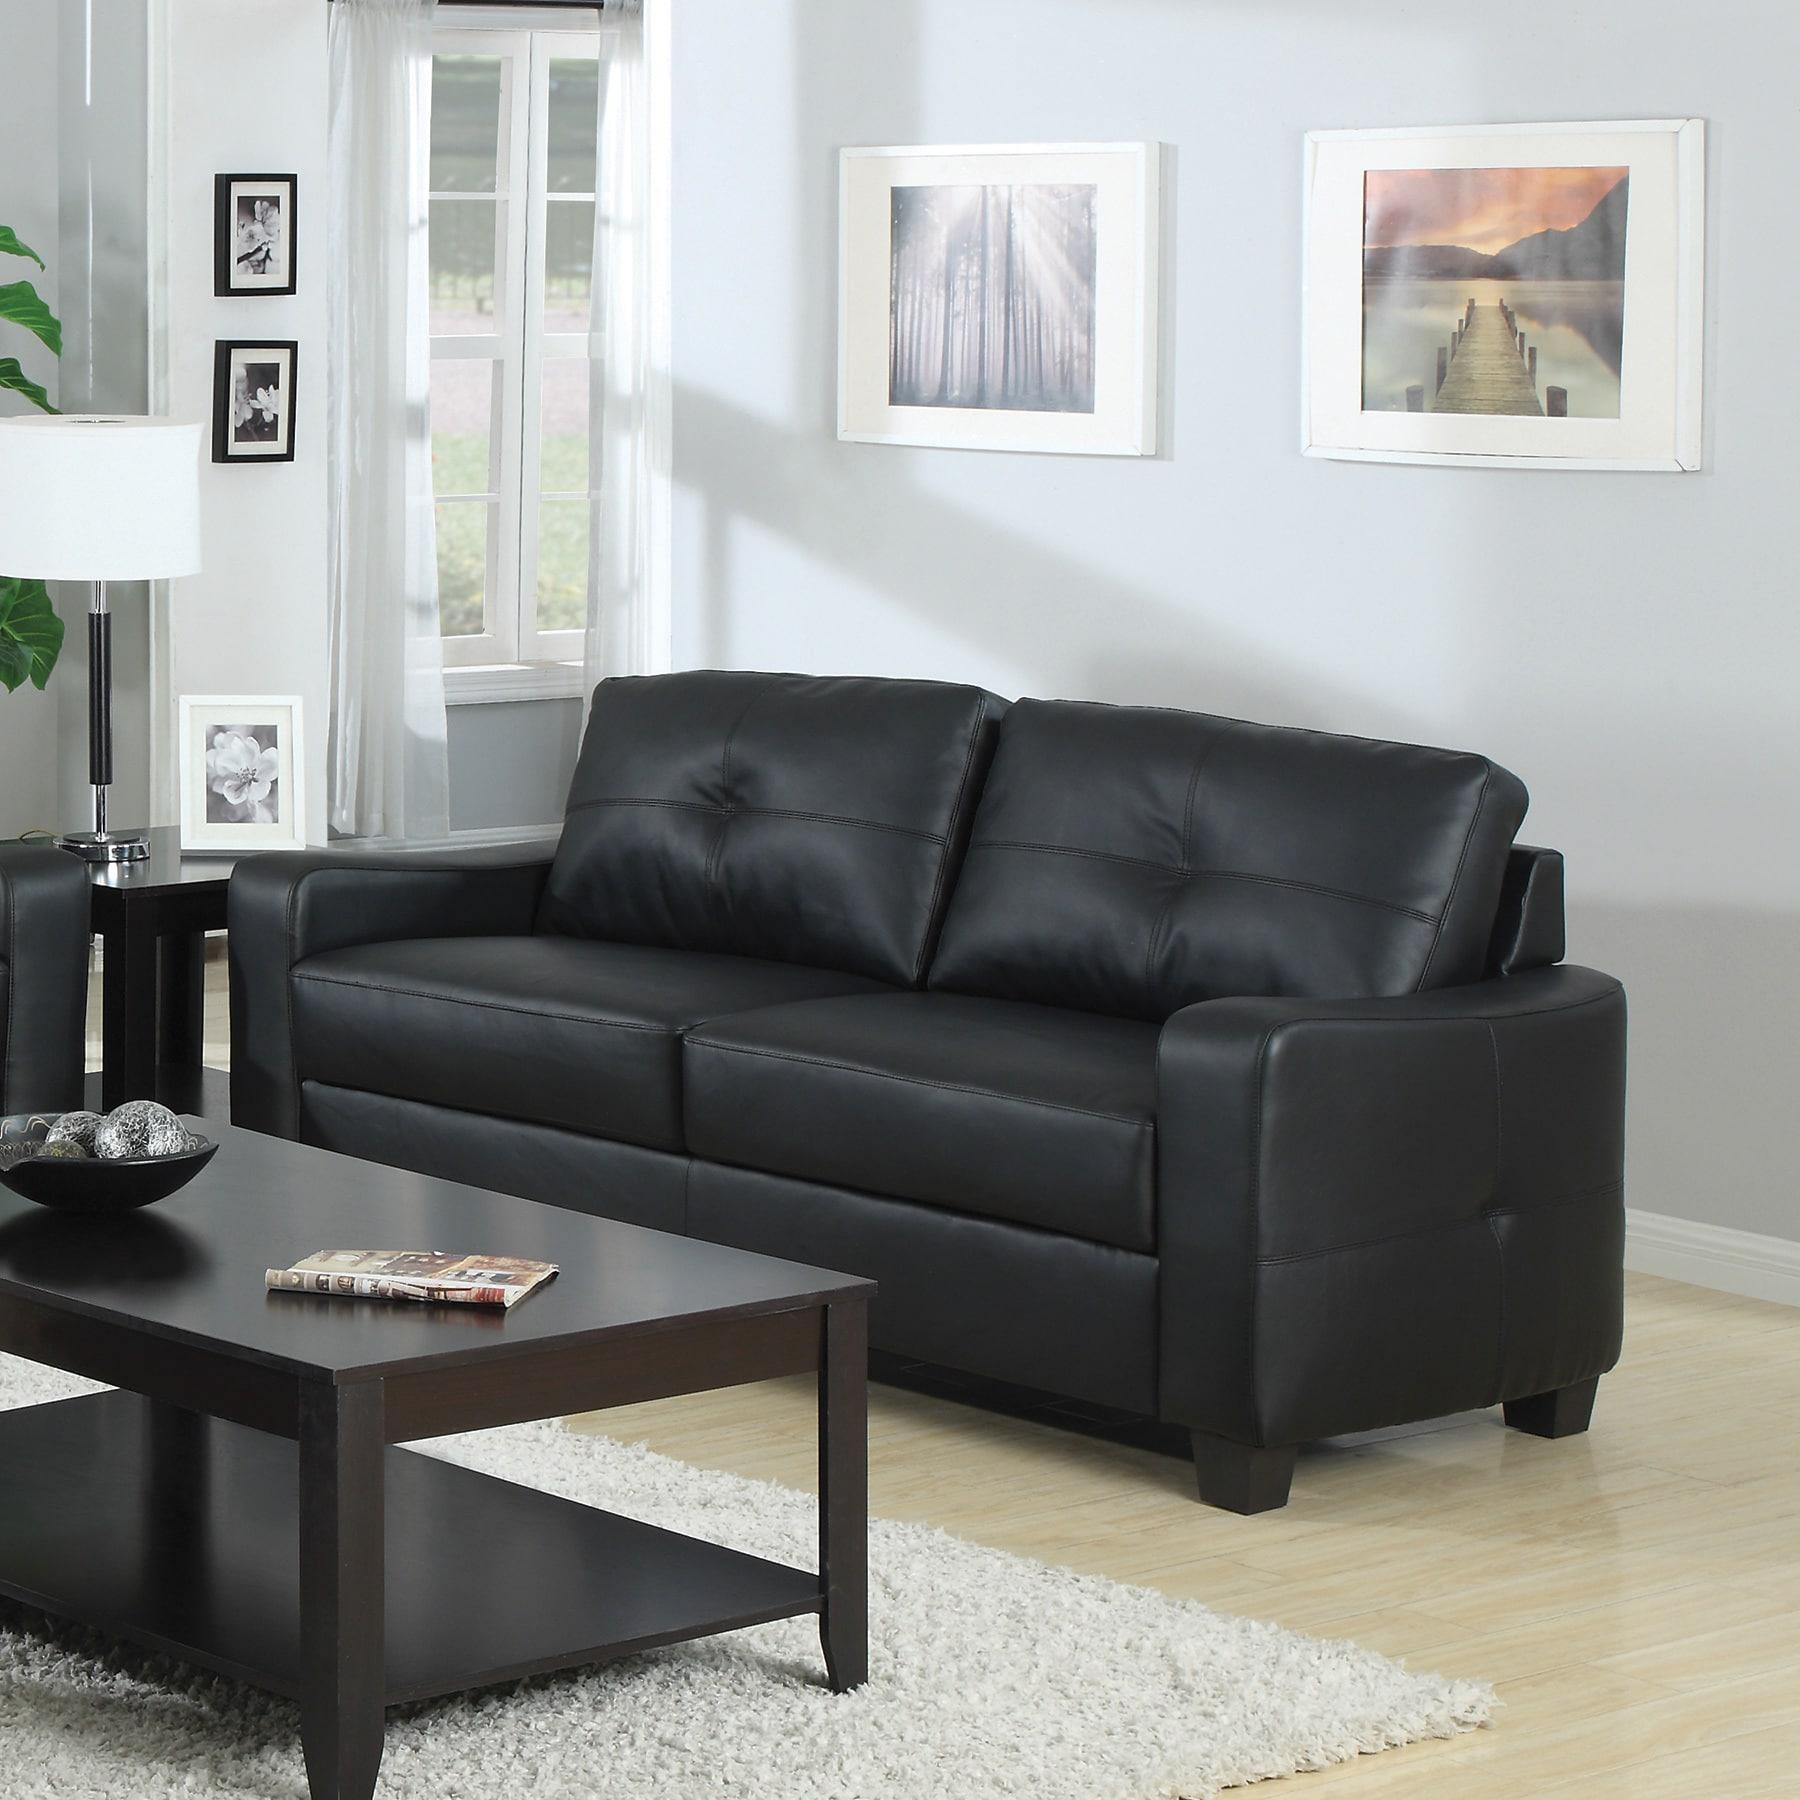 Coaster Furniture Jasmine Leather Sofa (Black) (Sofa)